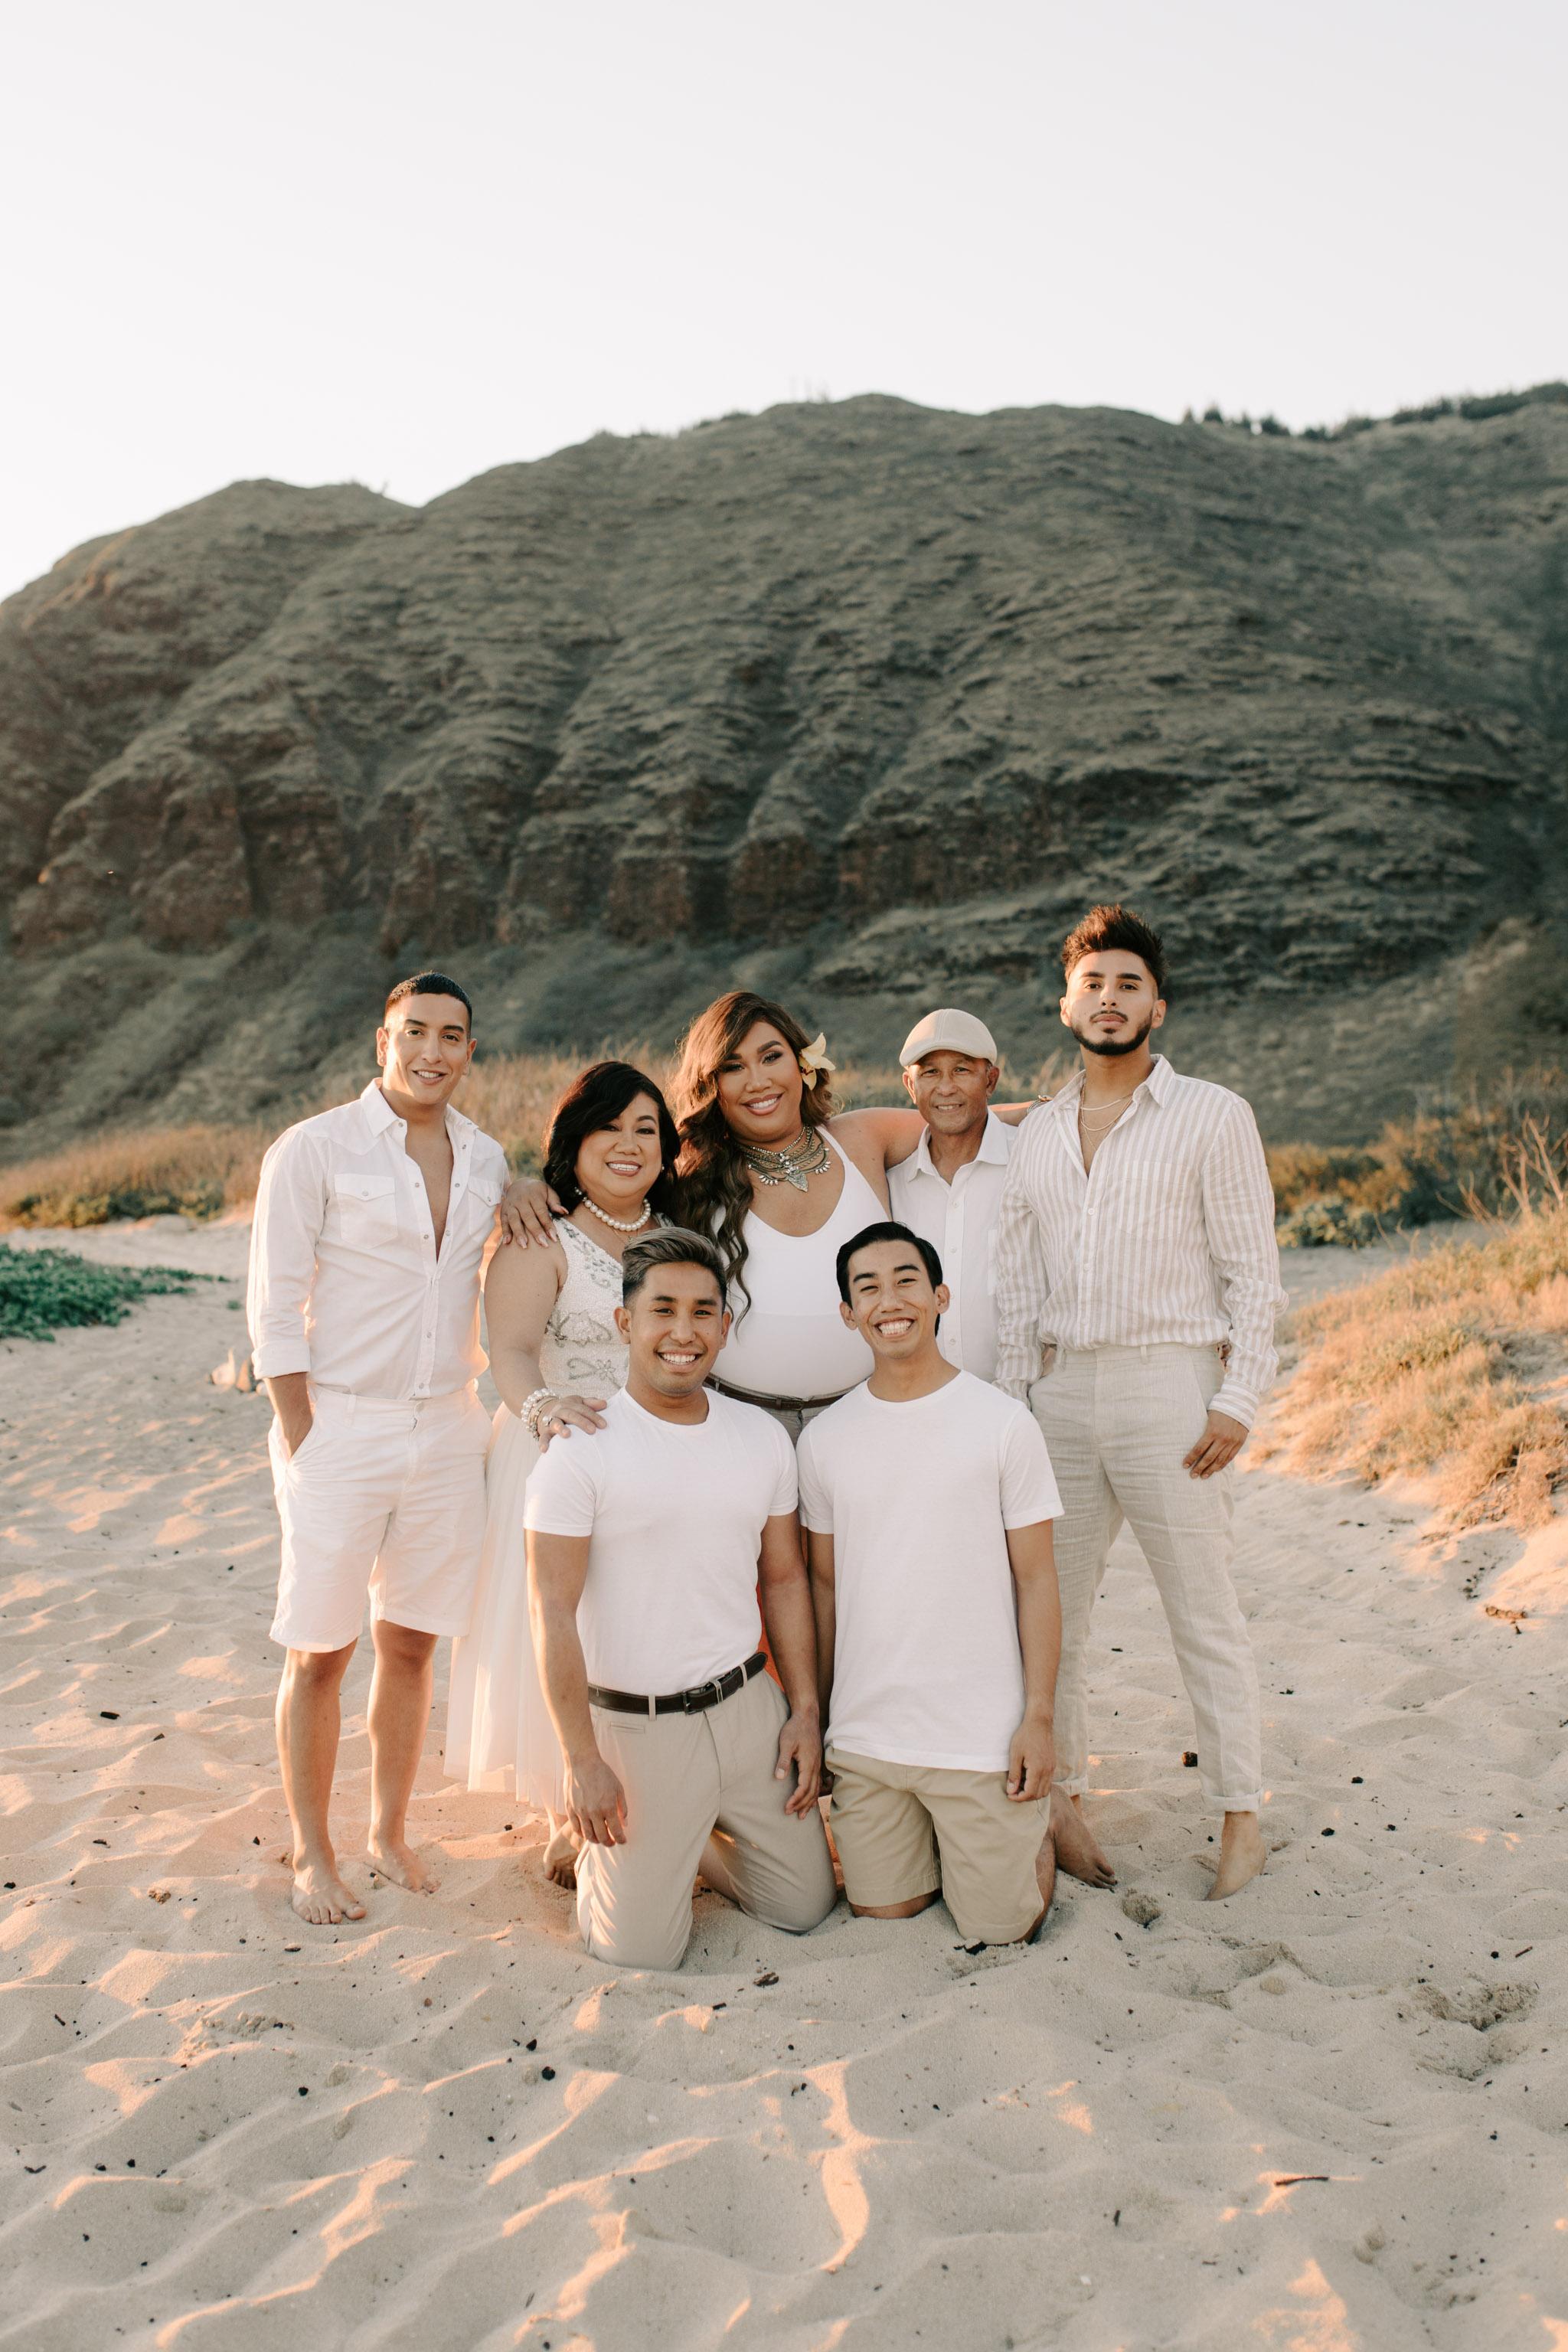 Patrick Starrr Hawaii Family Photos with Mama Starrr, Papa Starrr, Fabian Quinonez, and Roni Herrera by Hawaii family photographer Desiree Leilani